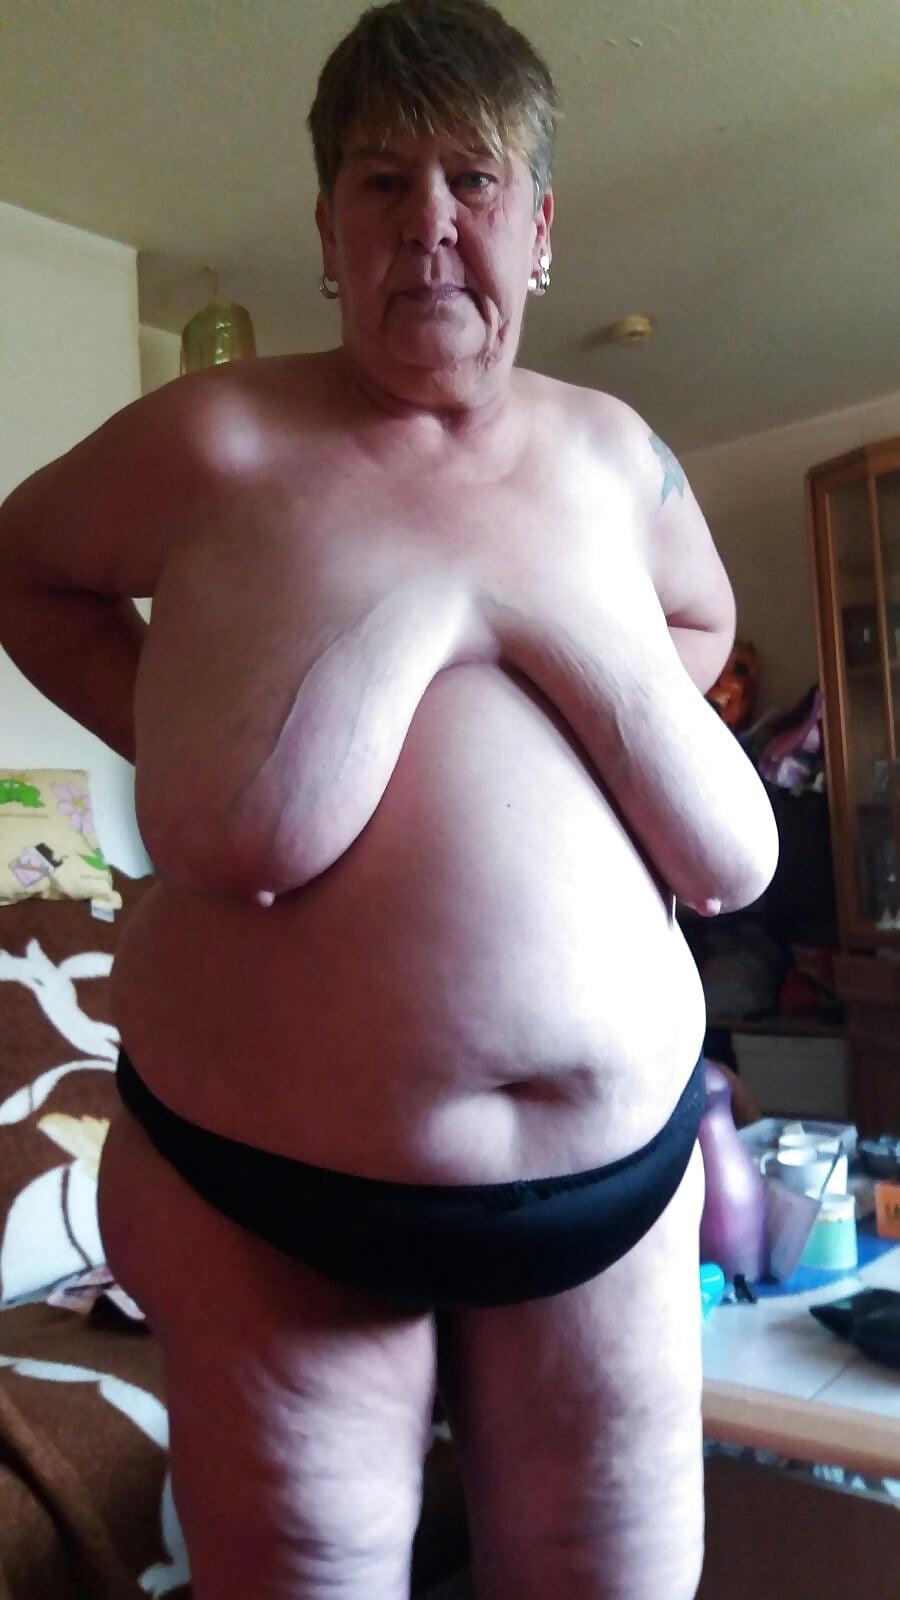 Old granny floppy boobs porn archive